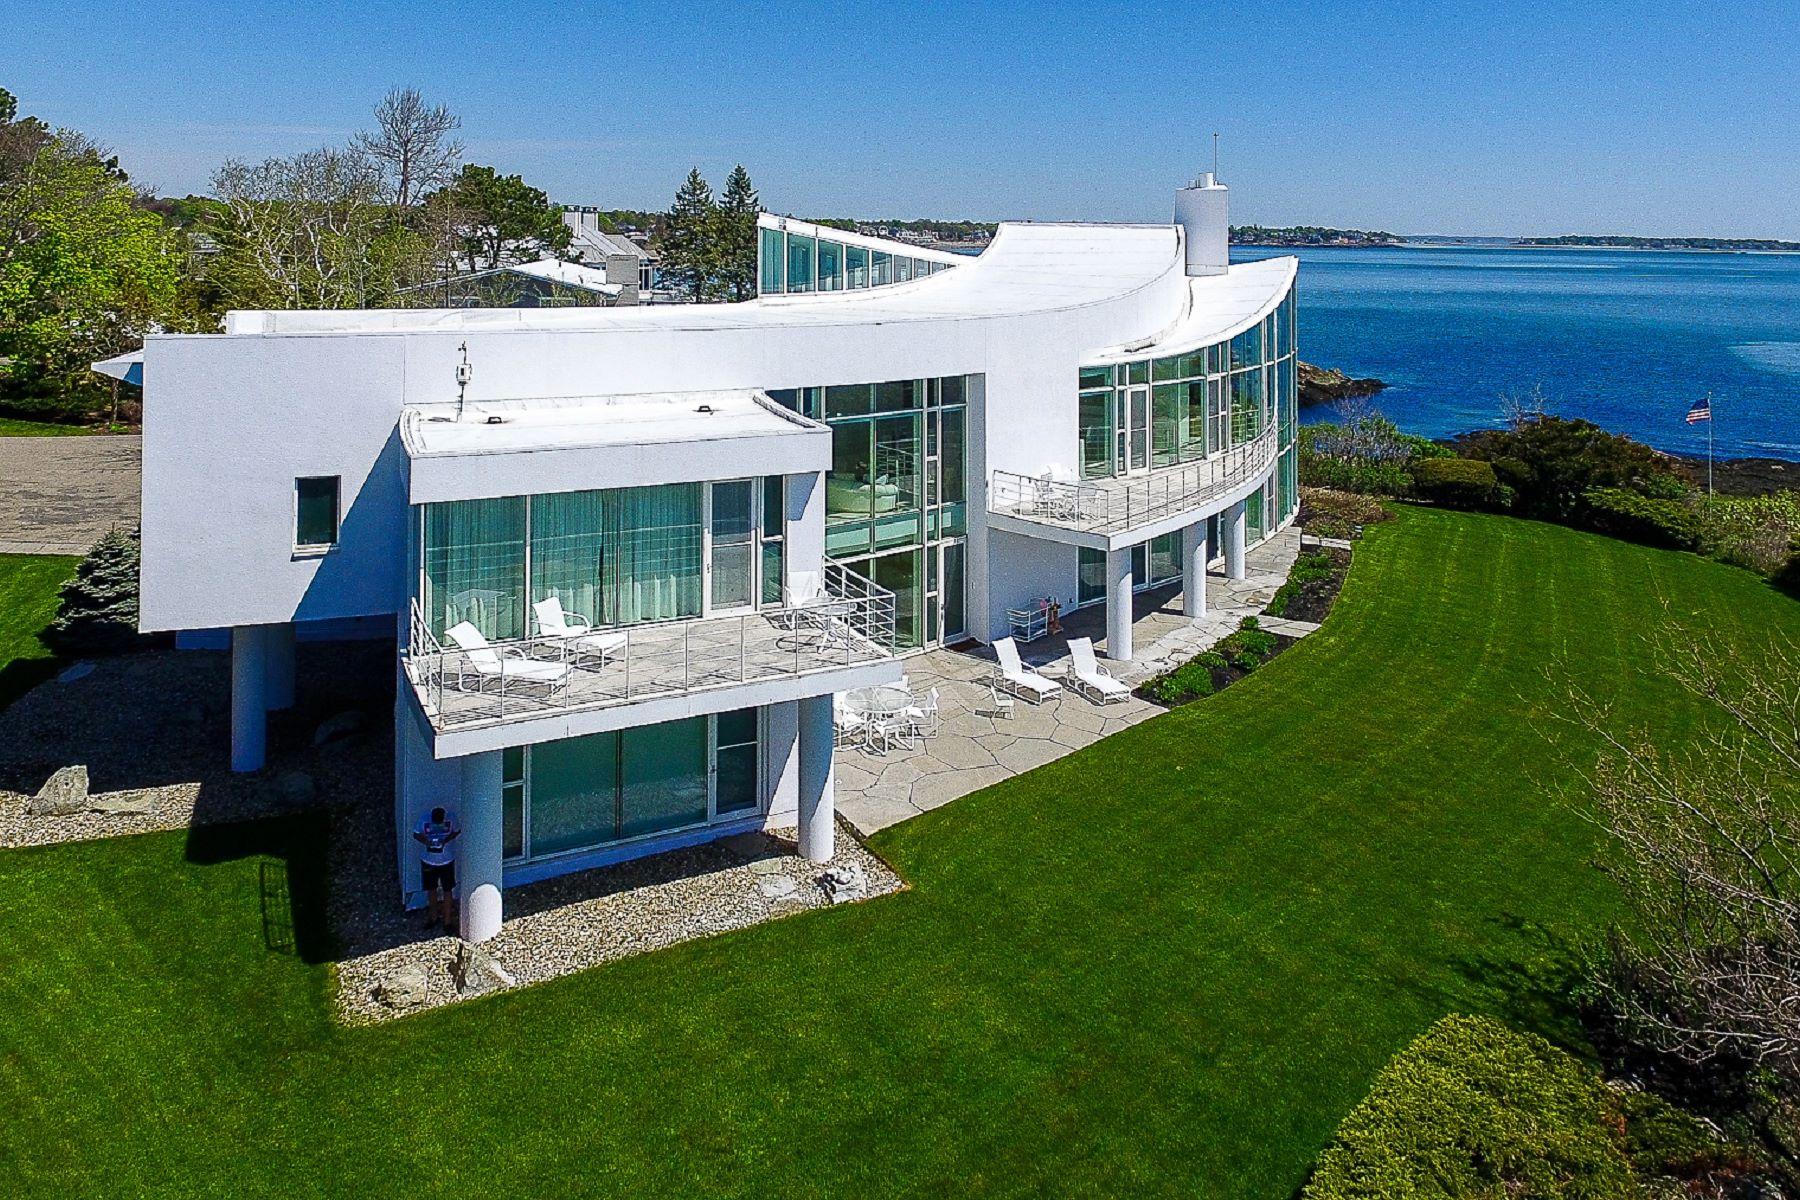 Casa Unifamiliar por un Venta en Extraordinary Ocean Front Contemporary Home 45 Little's Point Swampscott, Massachusetts 01907 Estados Unidos